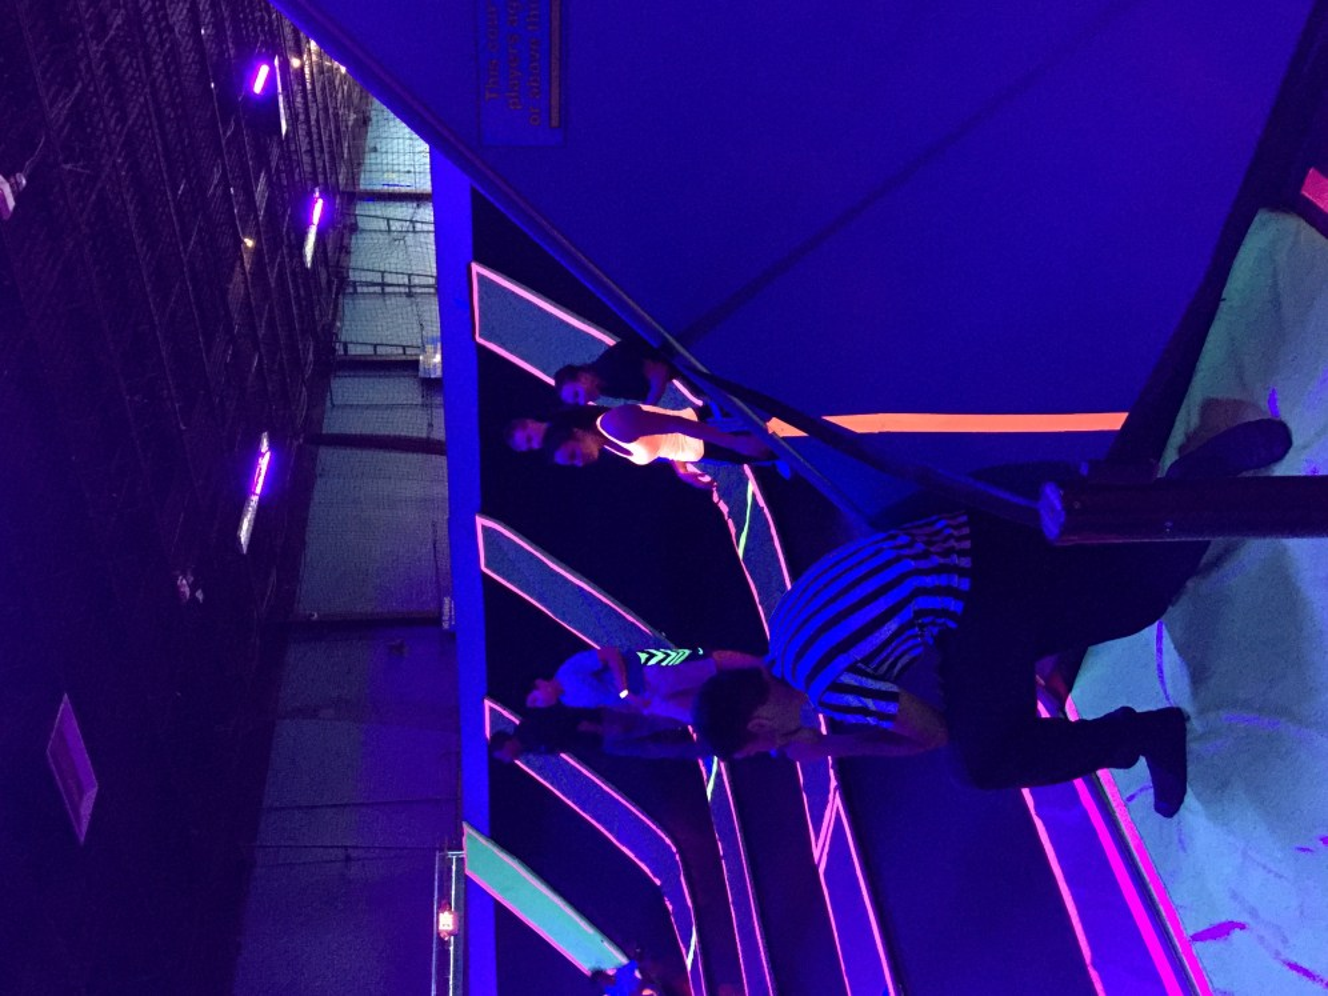 20150228 Phs LUMC Youth Bounce (44)